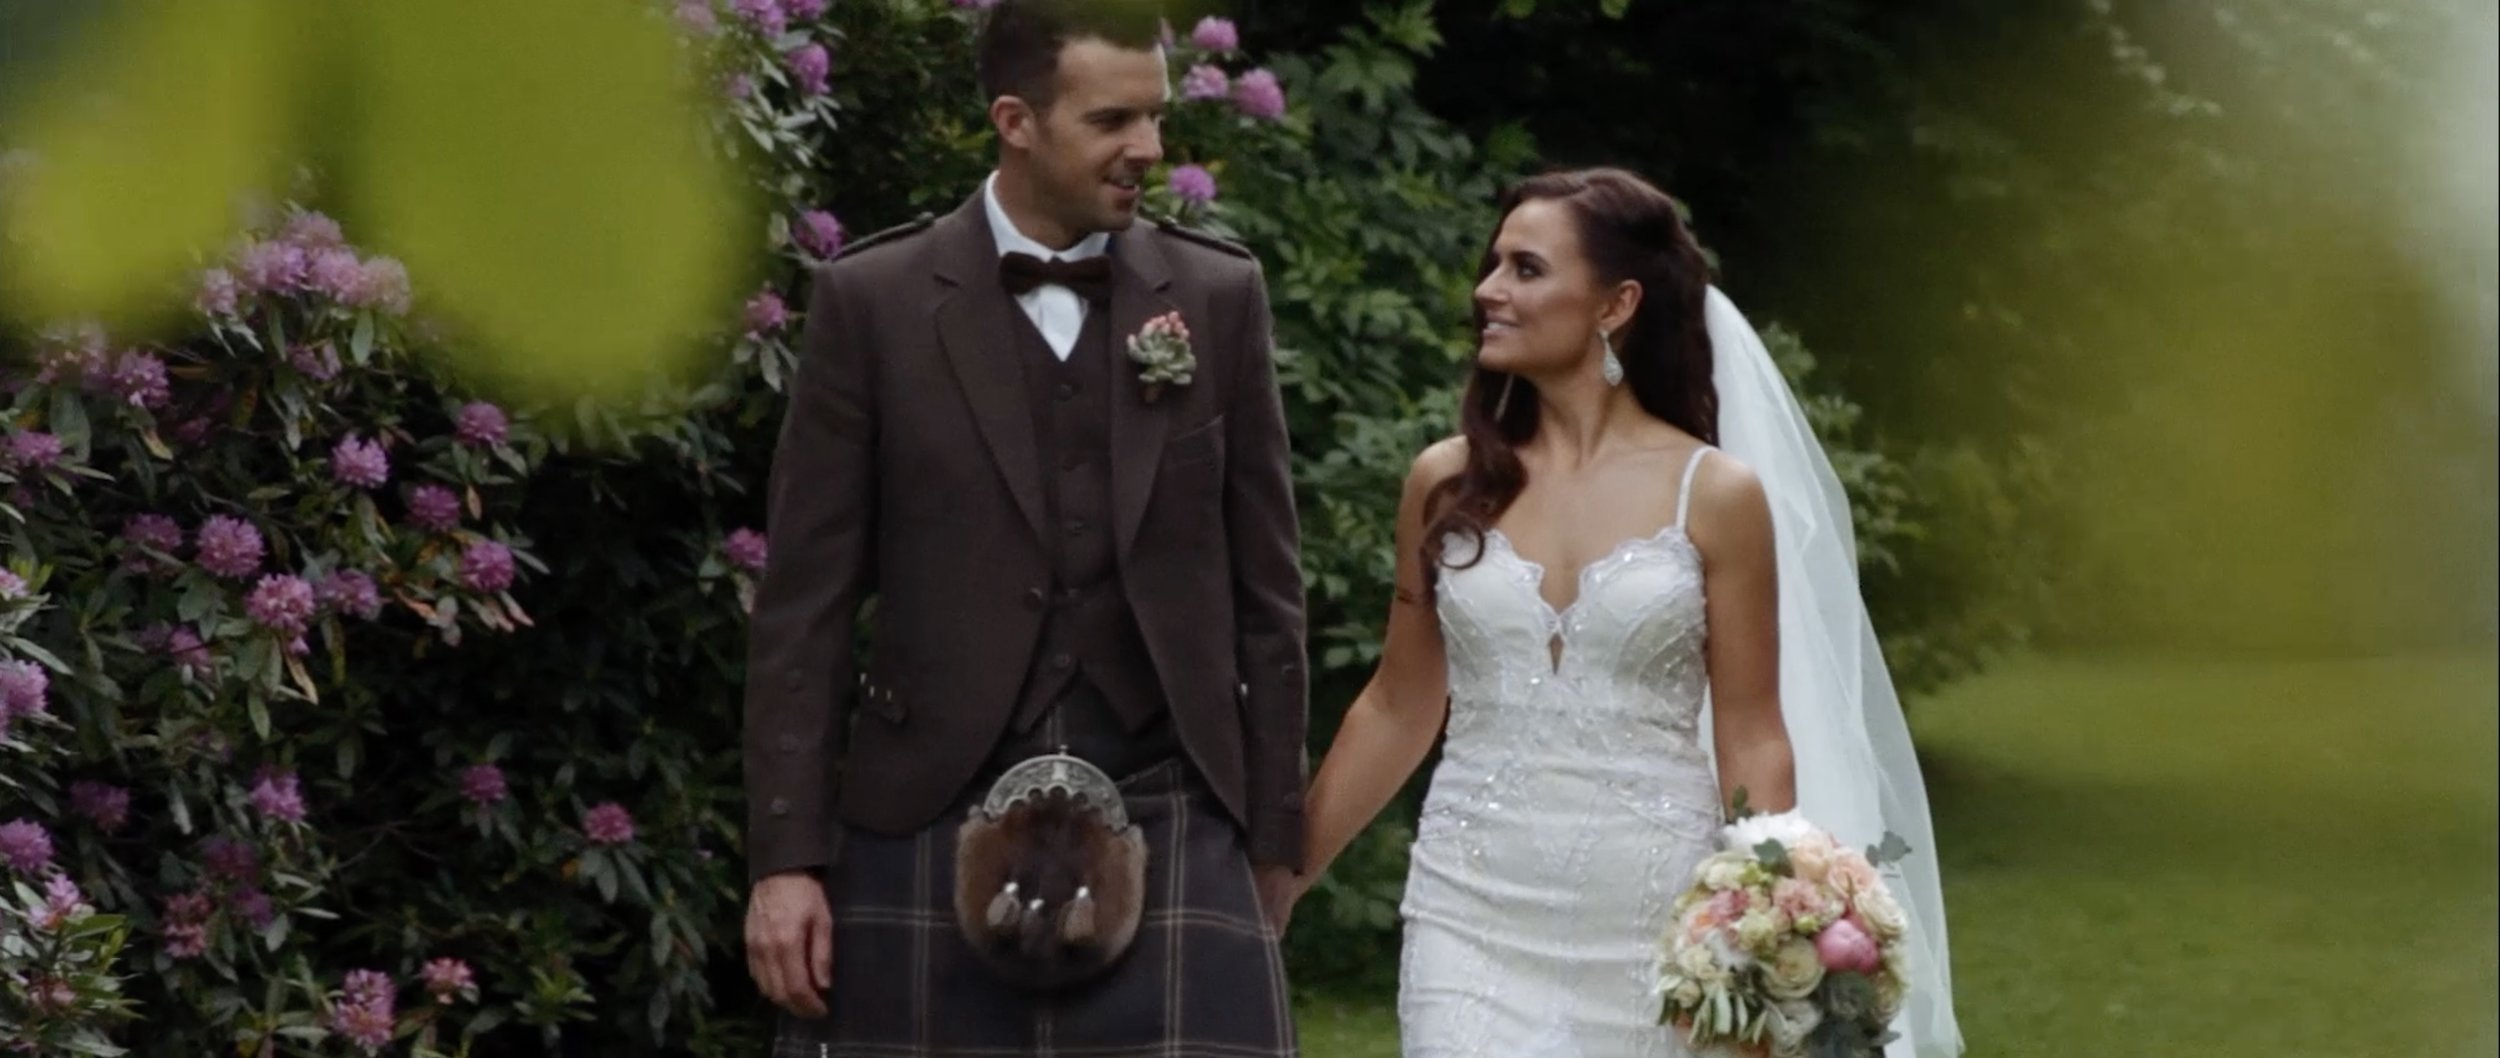 comrie-croft-wedding-videographer_LL_06.jpg